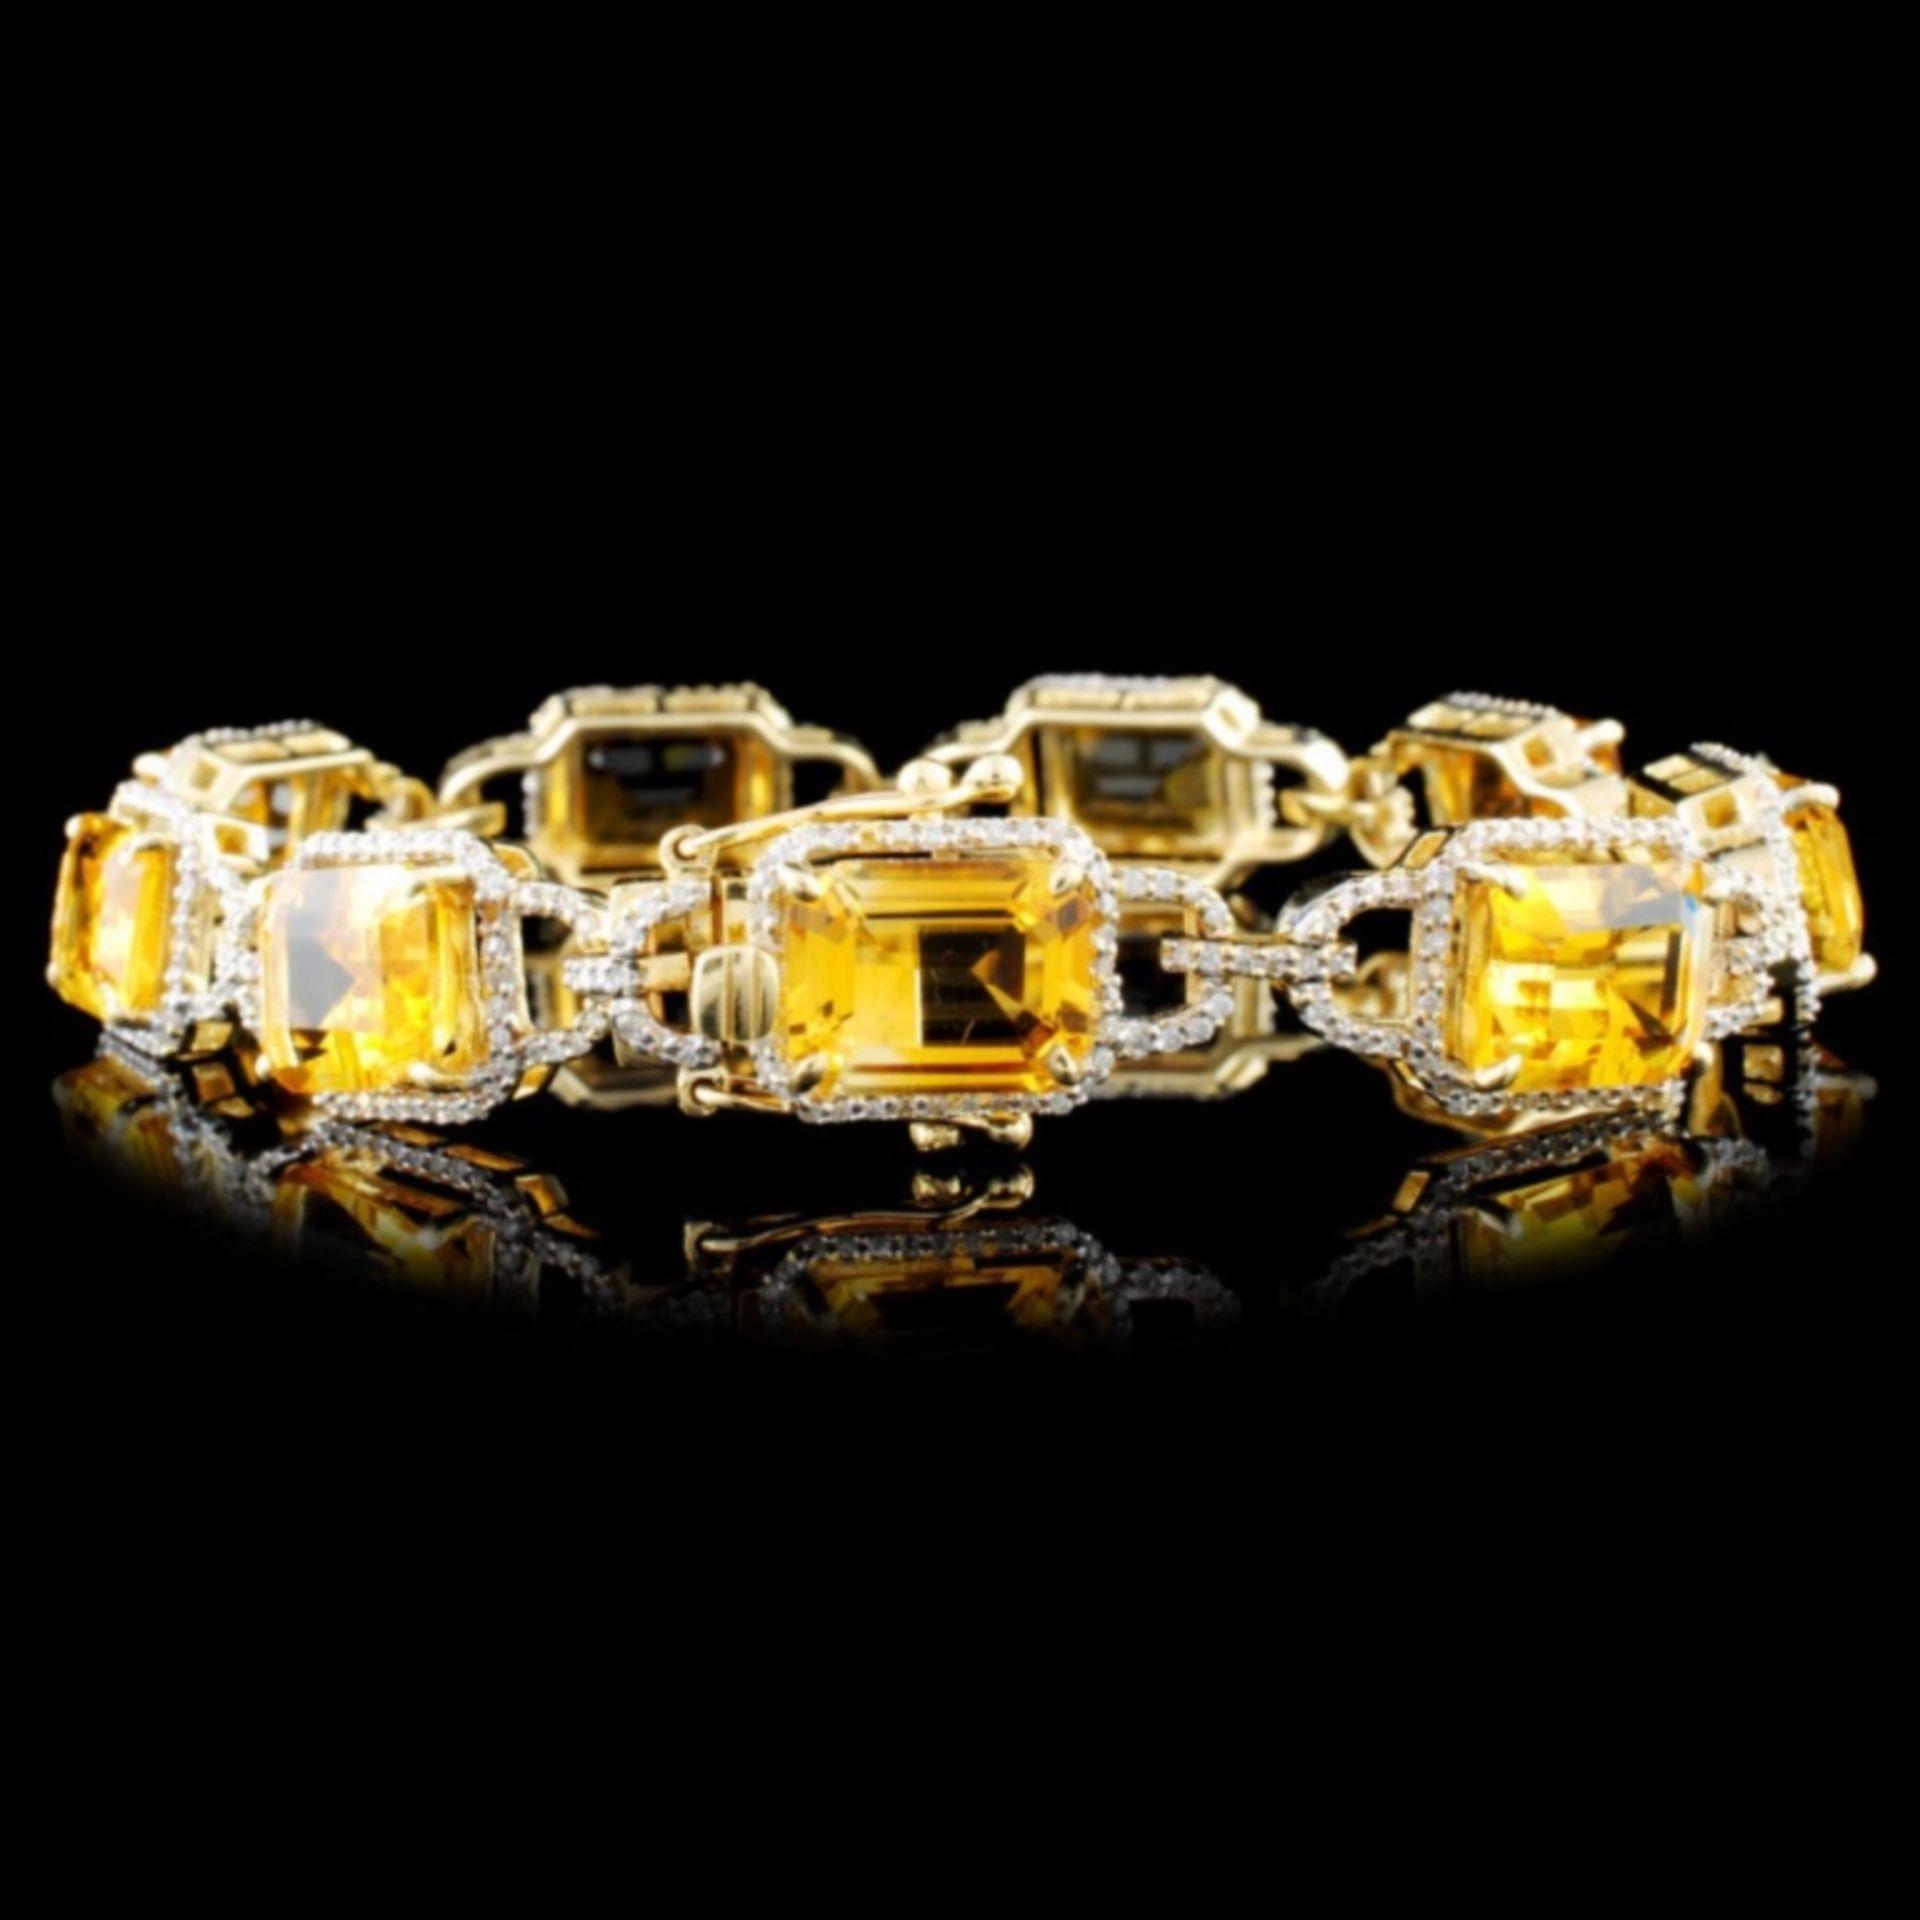 14K Gold 16.82ctw Citrine & 1.55ctw Diamond Bracel - Image 2 of 2